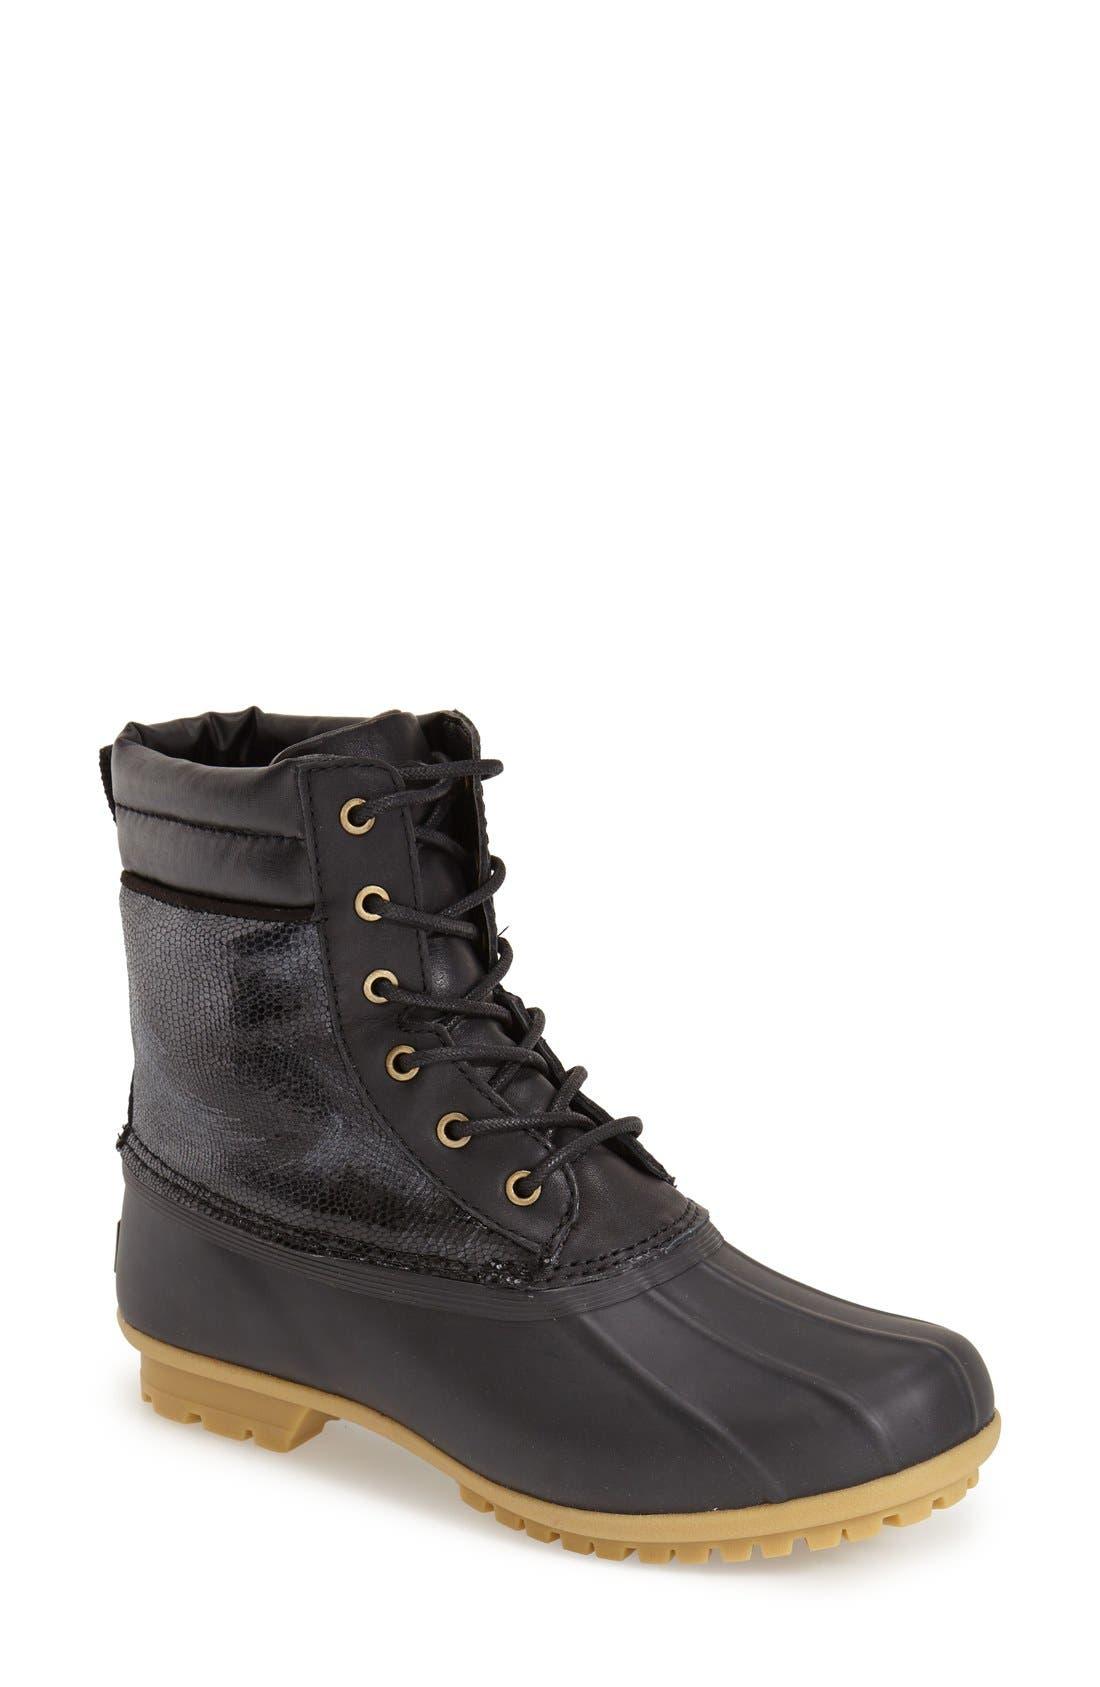 'Caldwell' Rain Boot, Main, color, 001